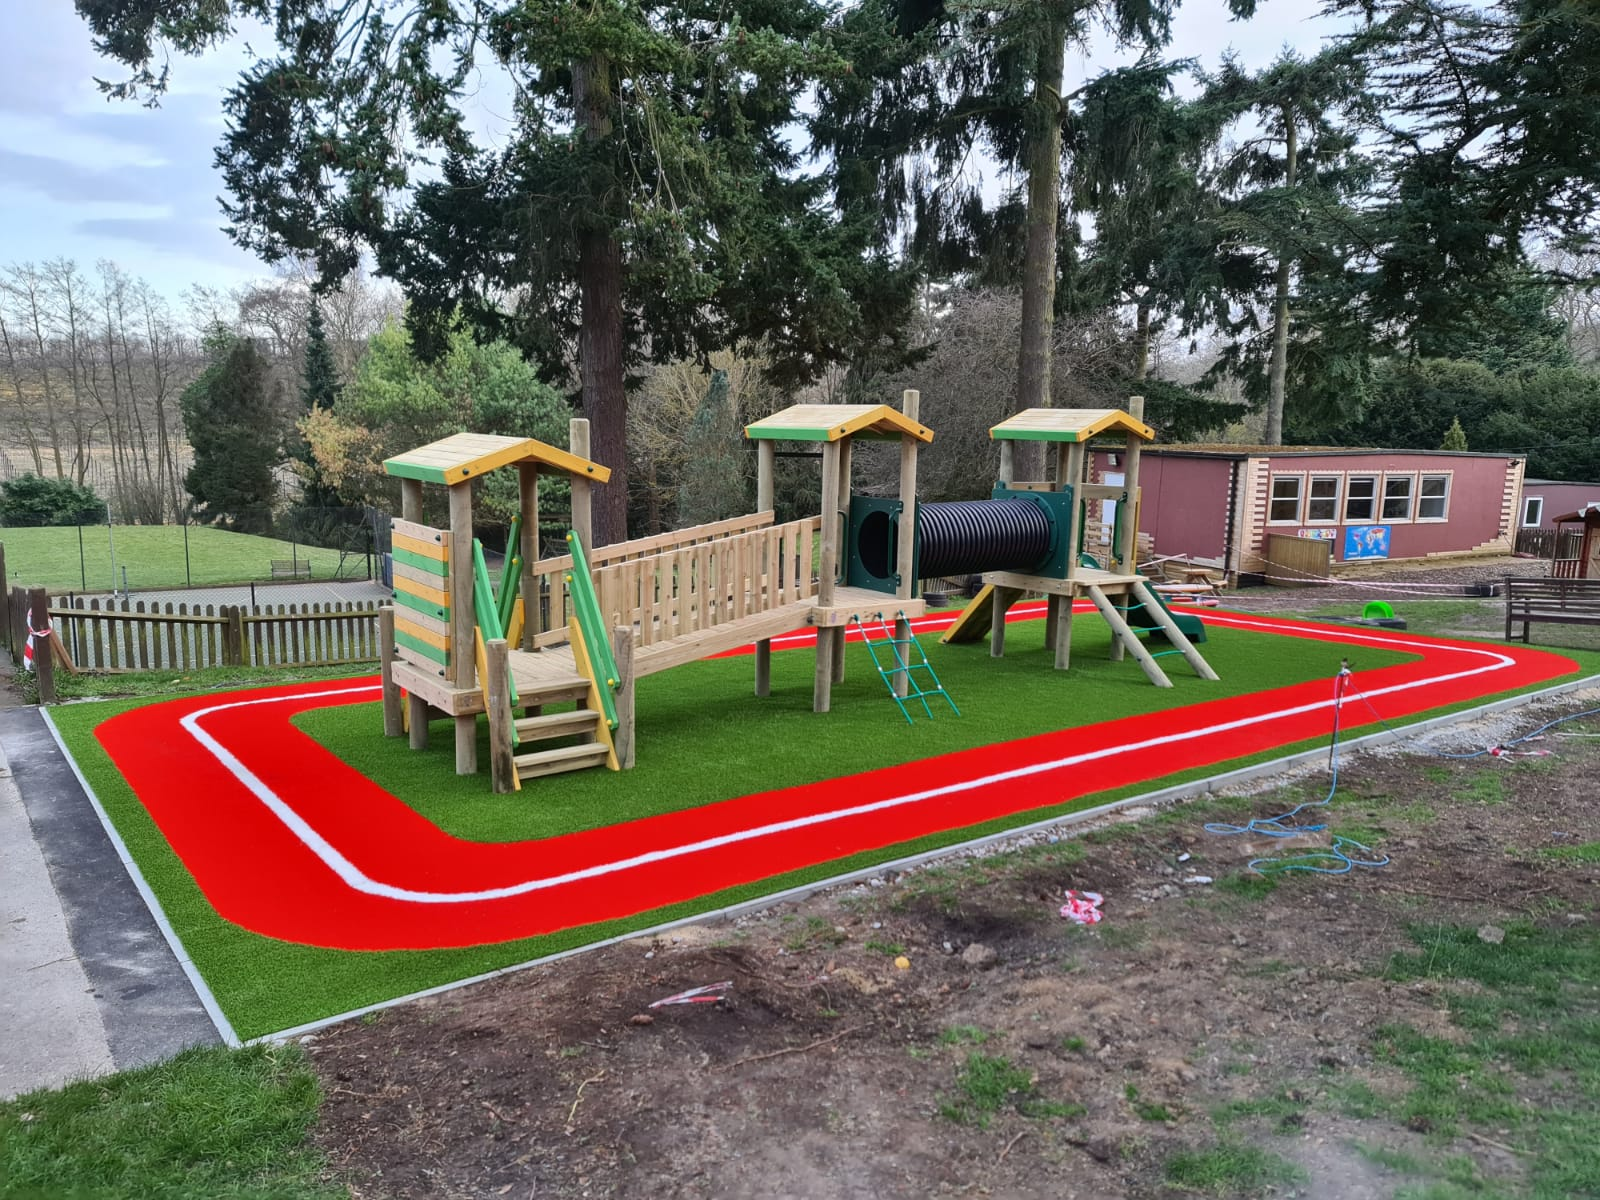 Rainbow red track